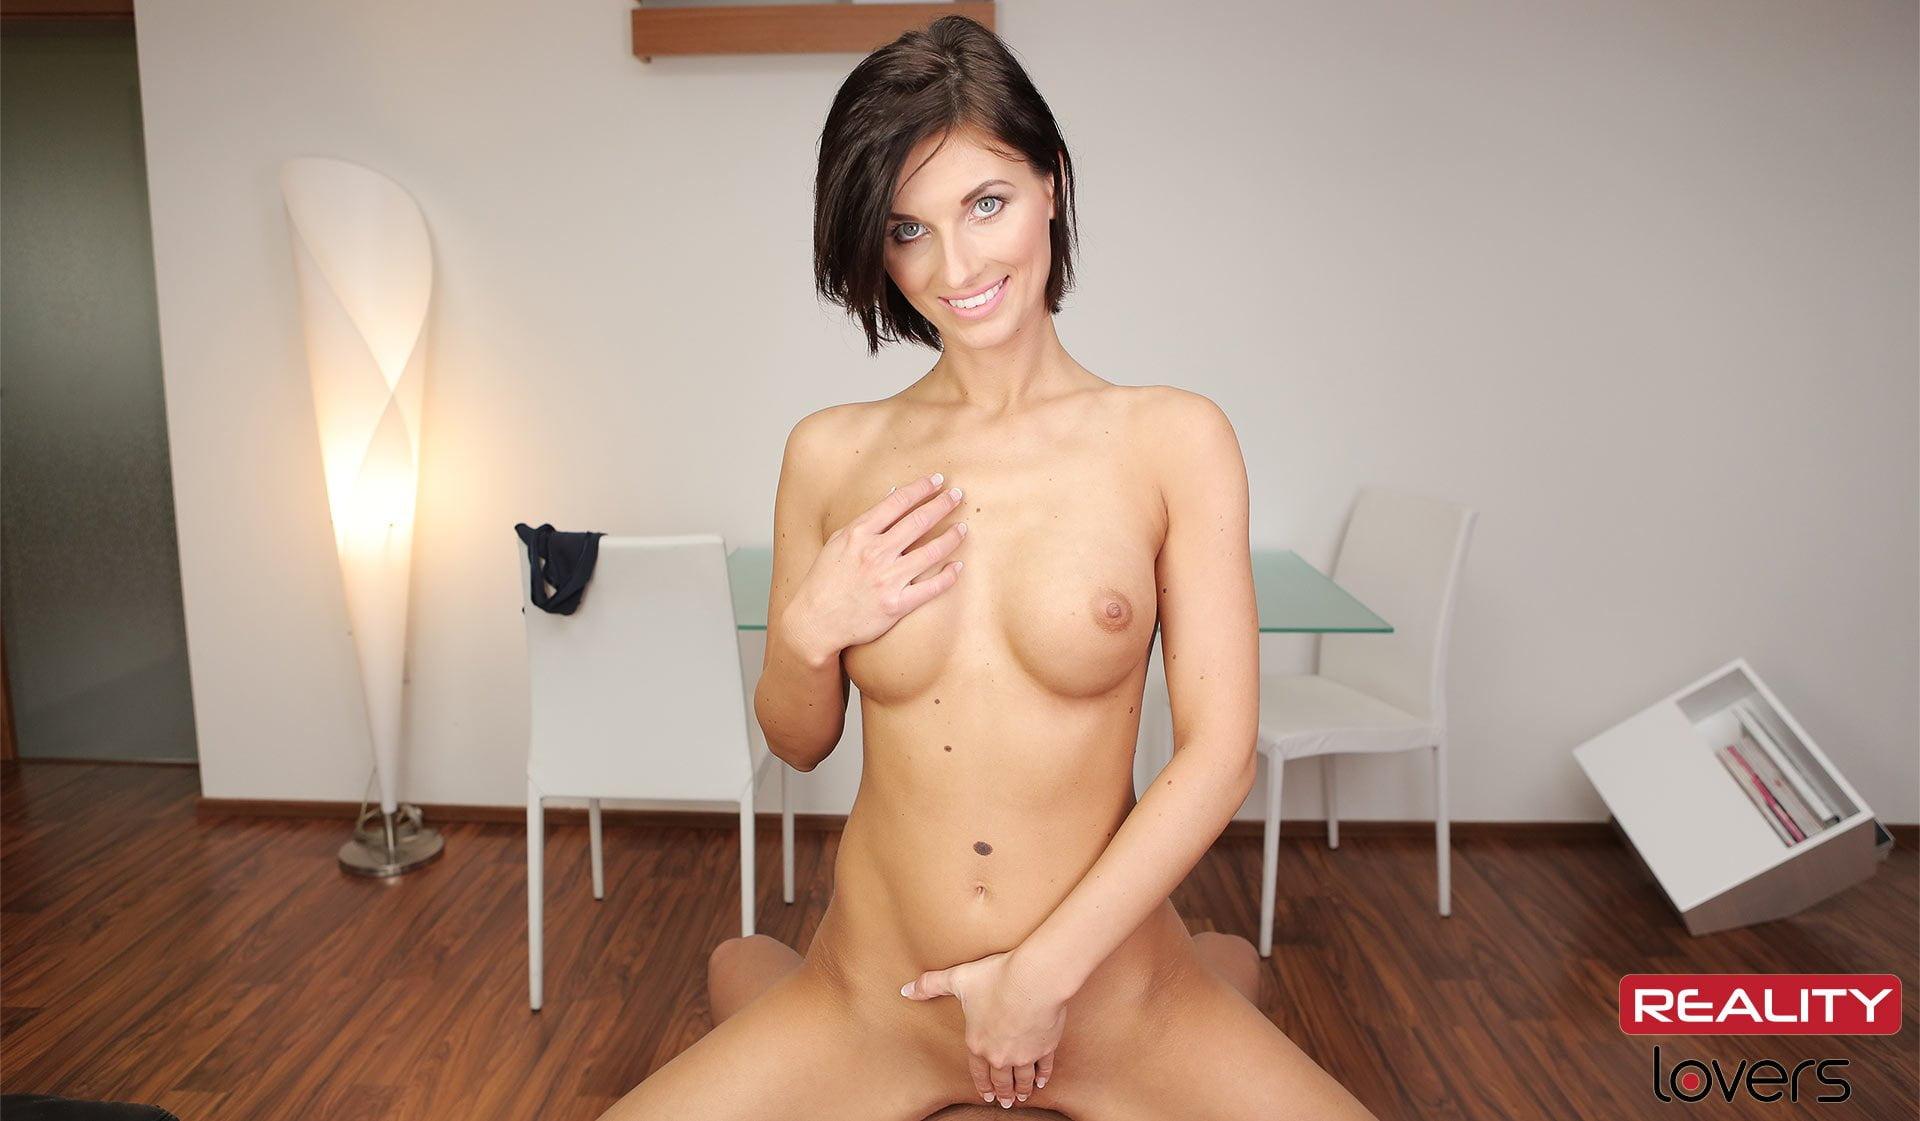 Jinnifer lovers porn pics images